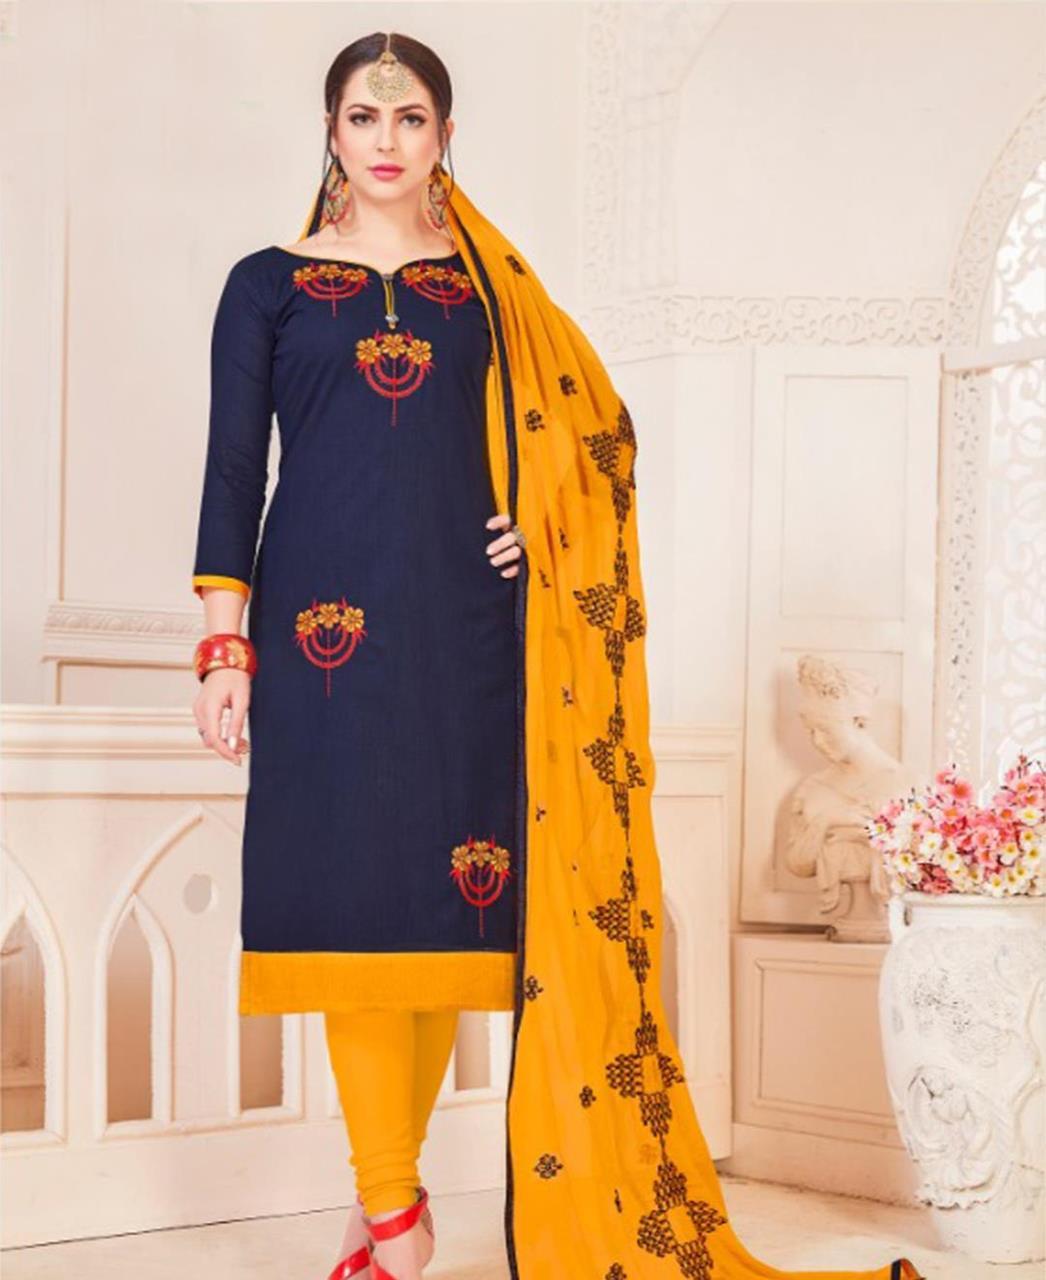 Embroidered Cotton Navyblue Straight Cut Salwar Kameez